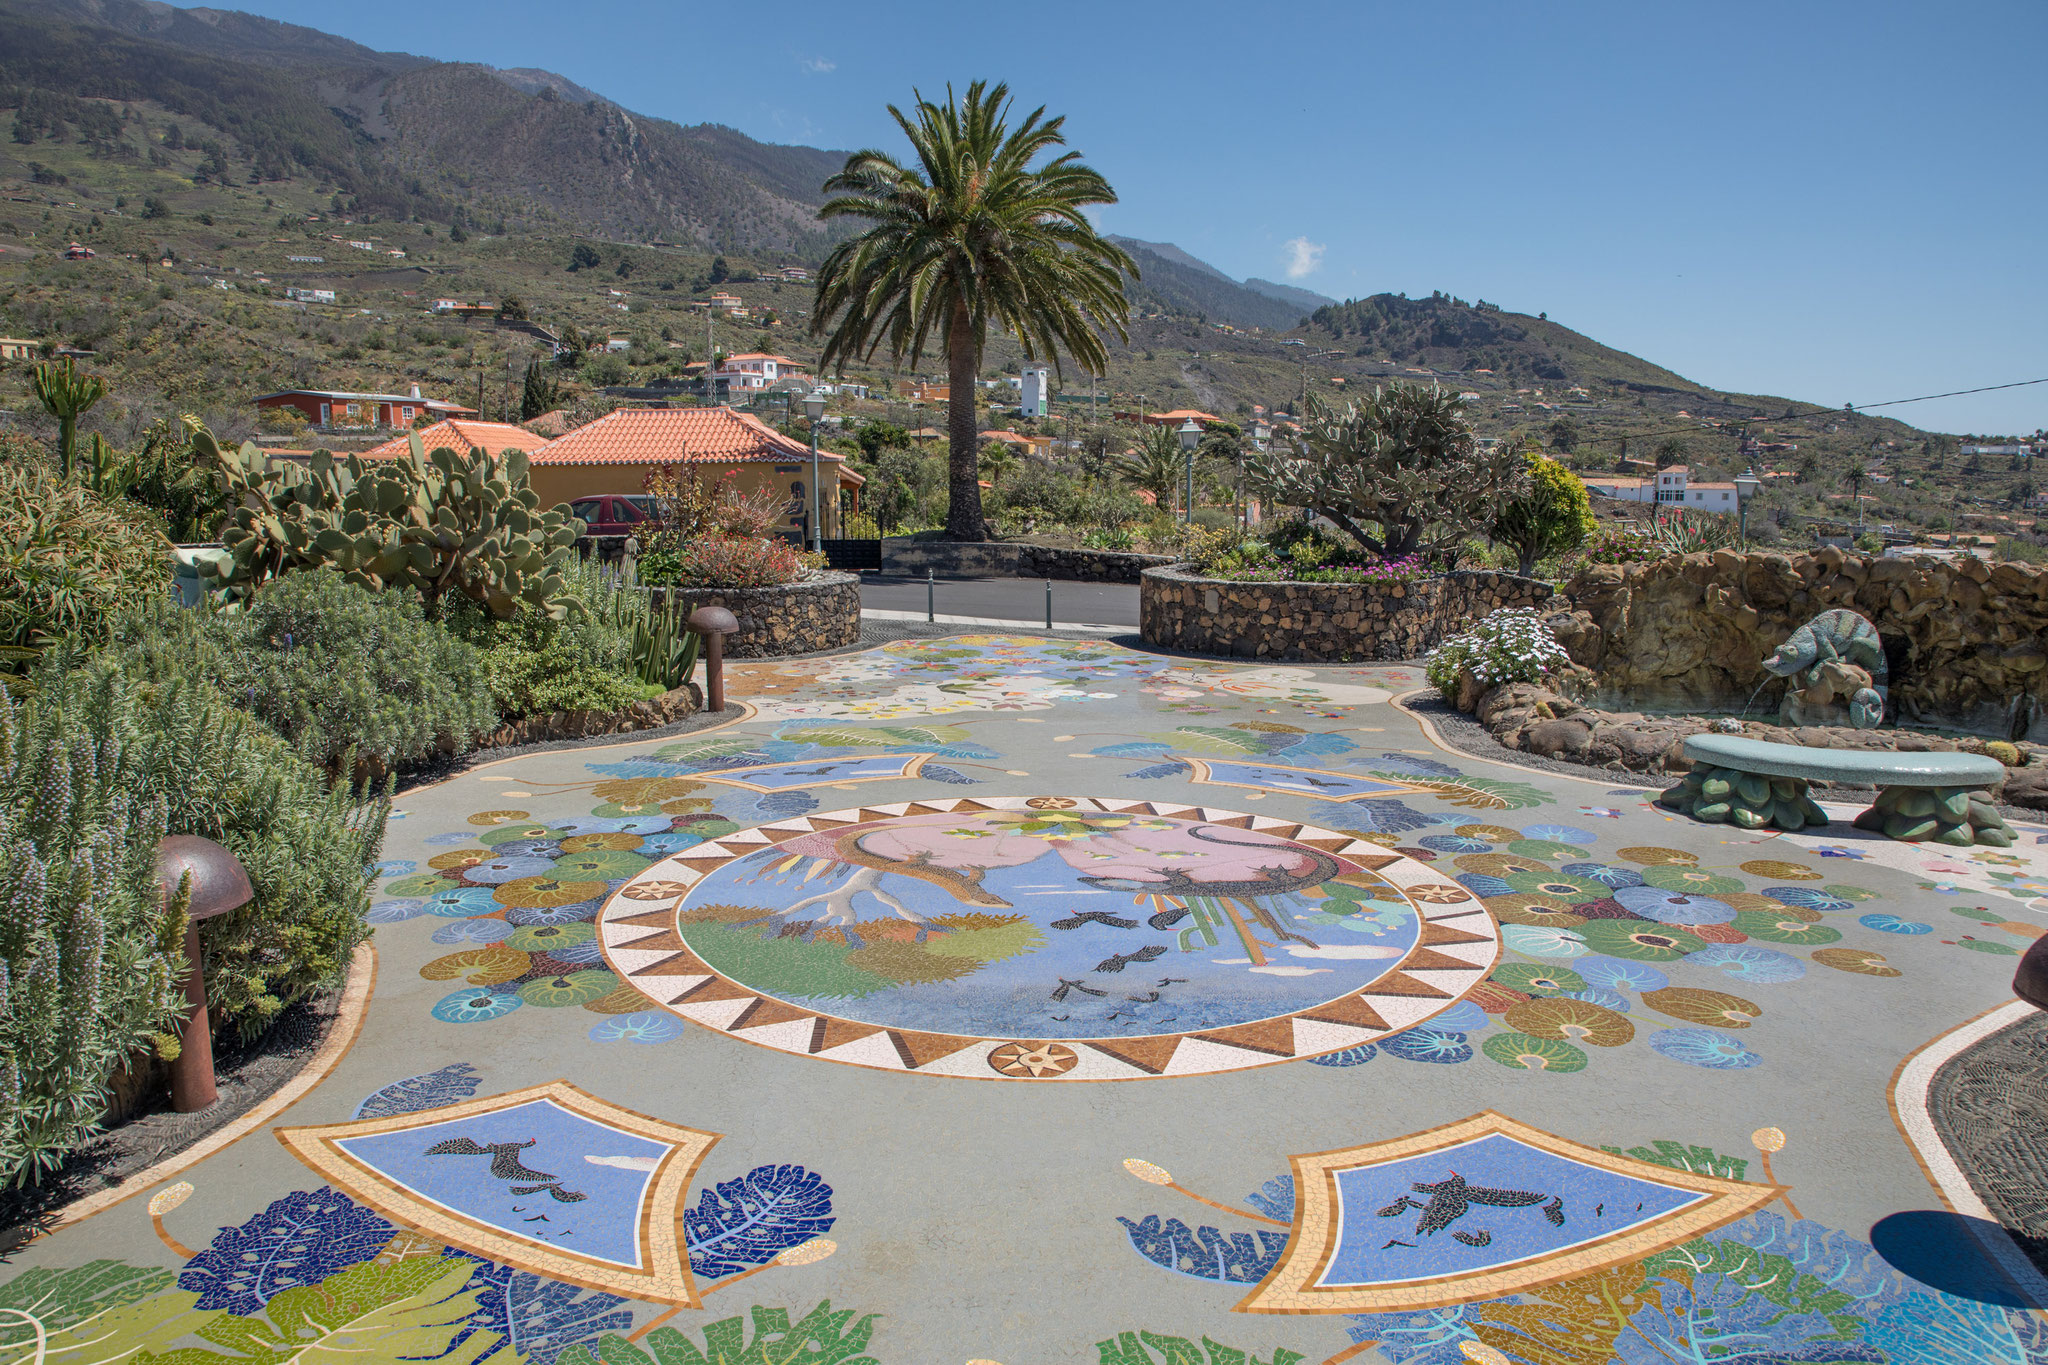 Plaza de la Glorieta in Las Manchas